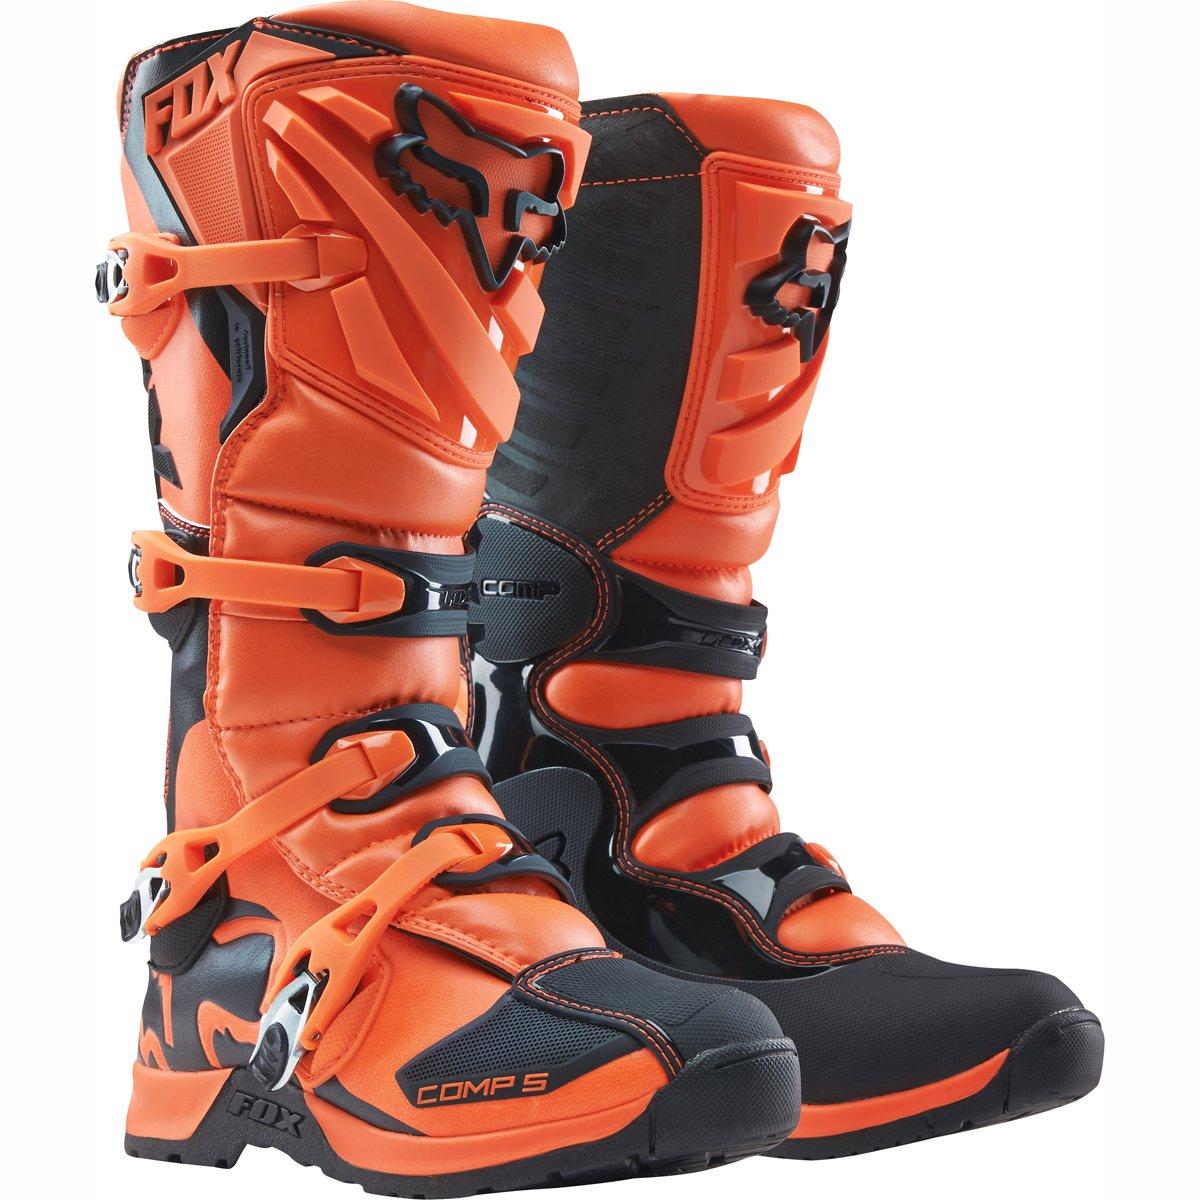 2018 Fox Racing Youth Comp 5 Boots-Orange-Y8